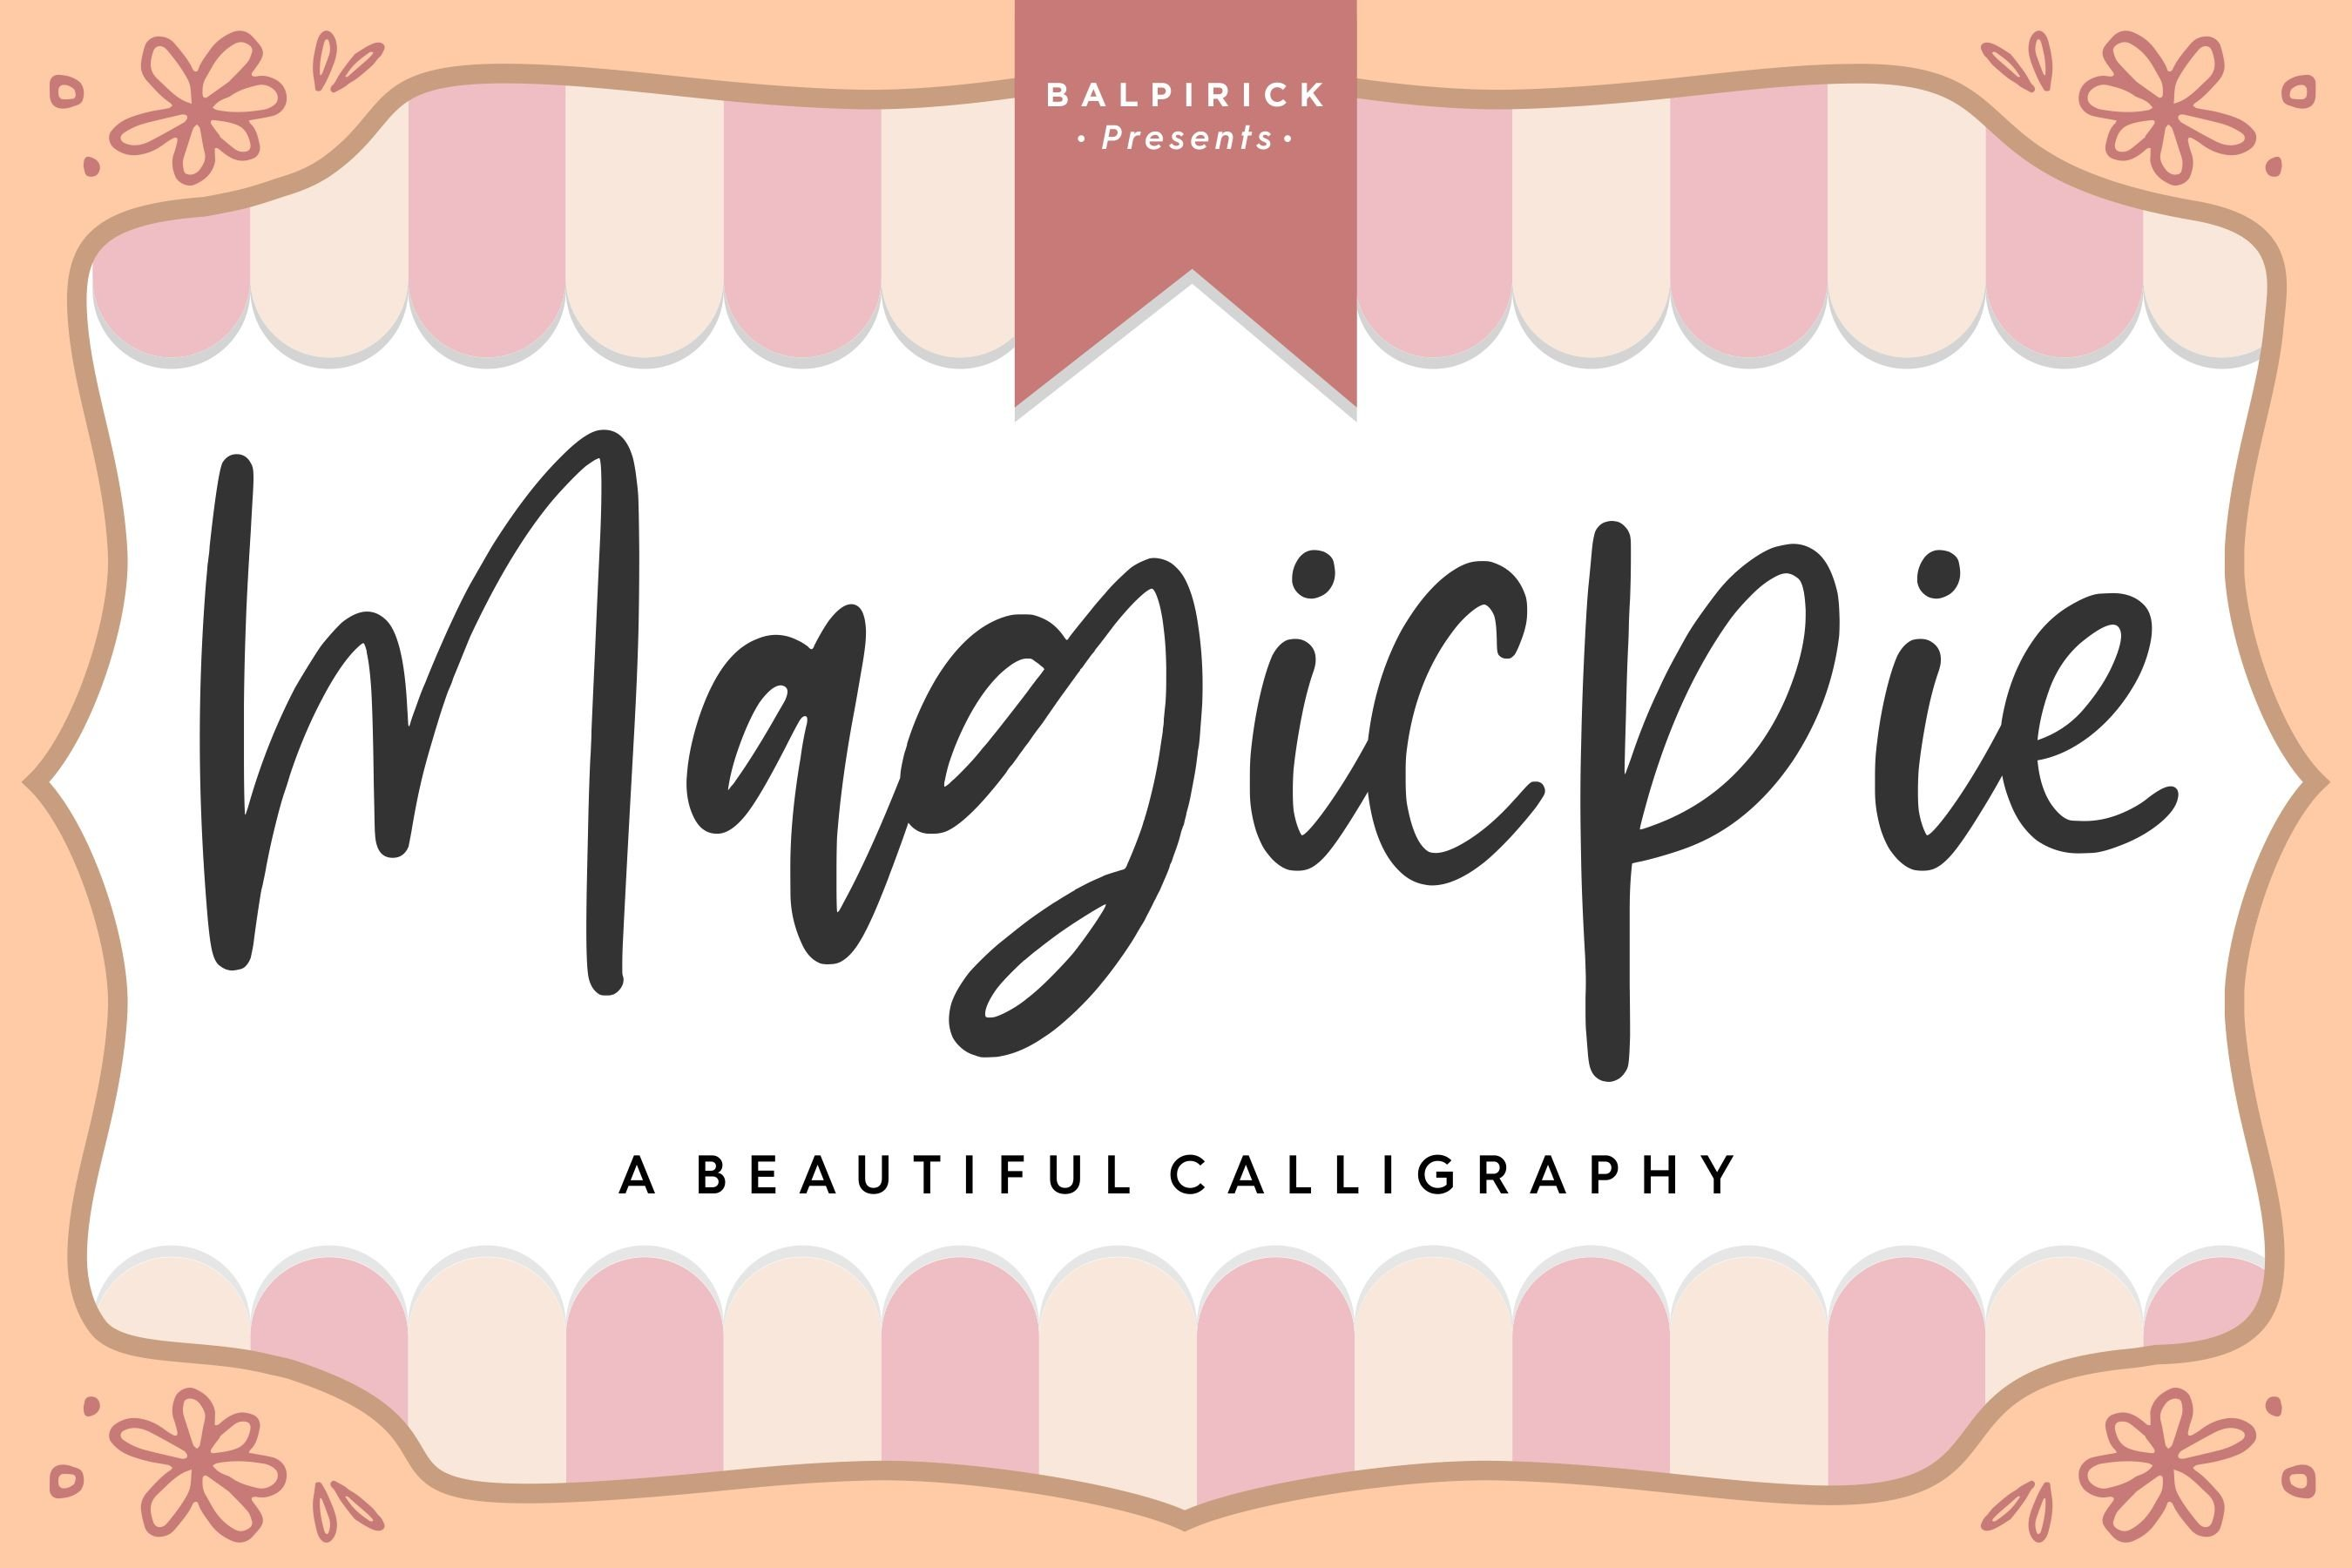 Magicpie Beautiful Calligraphy example image 1